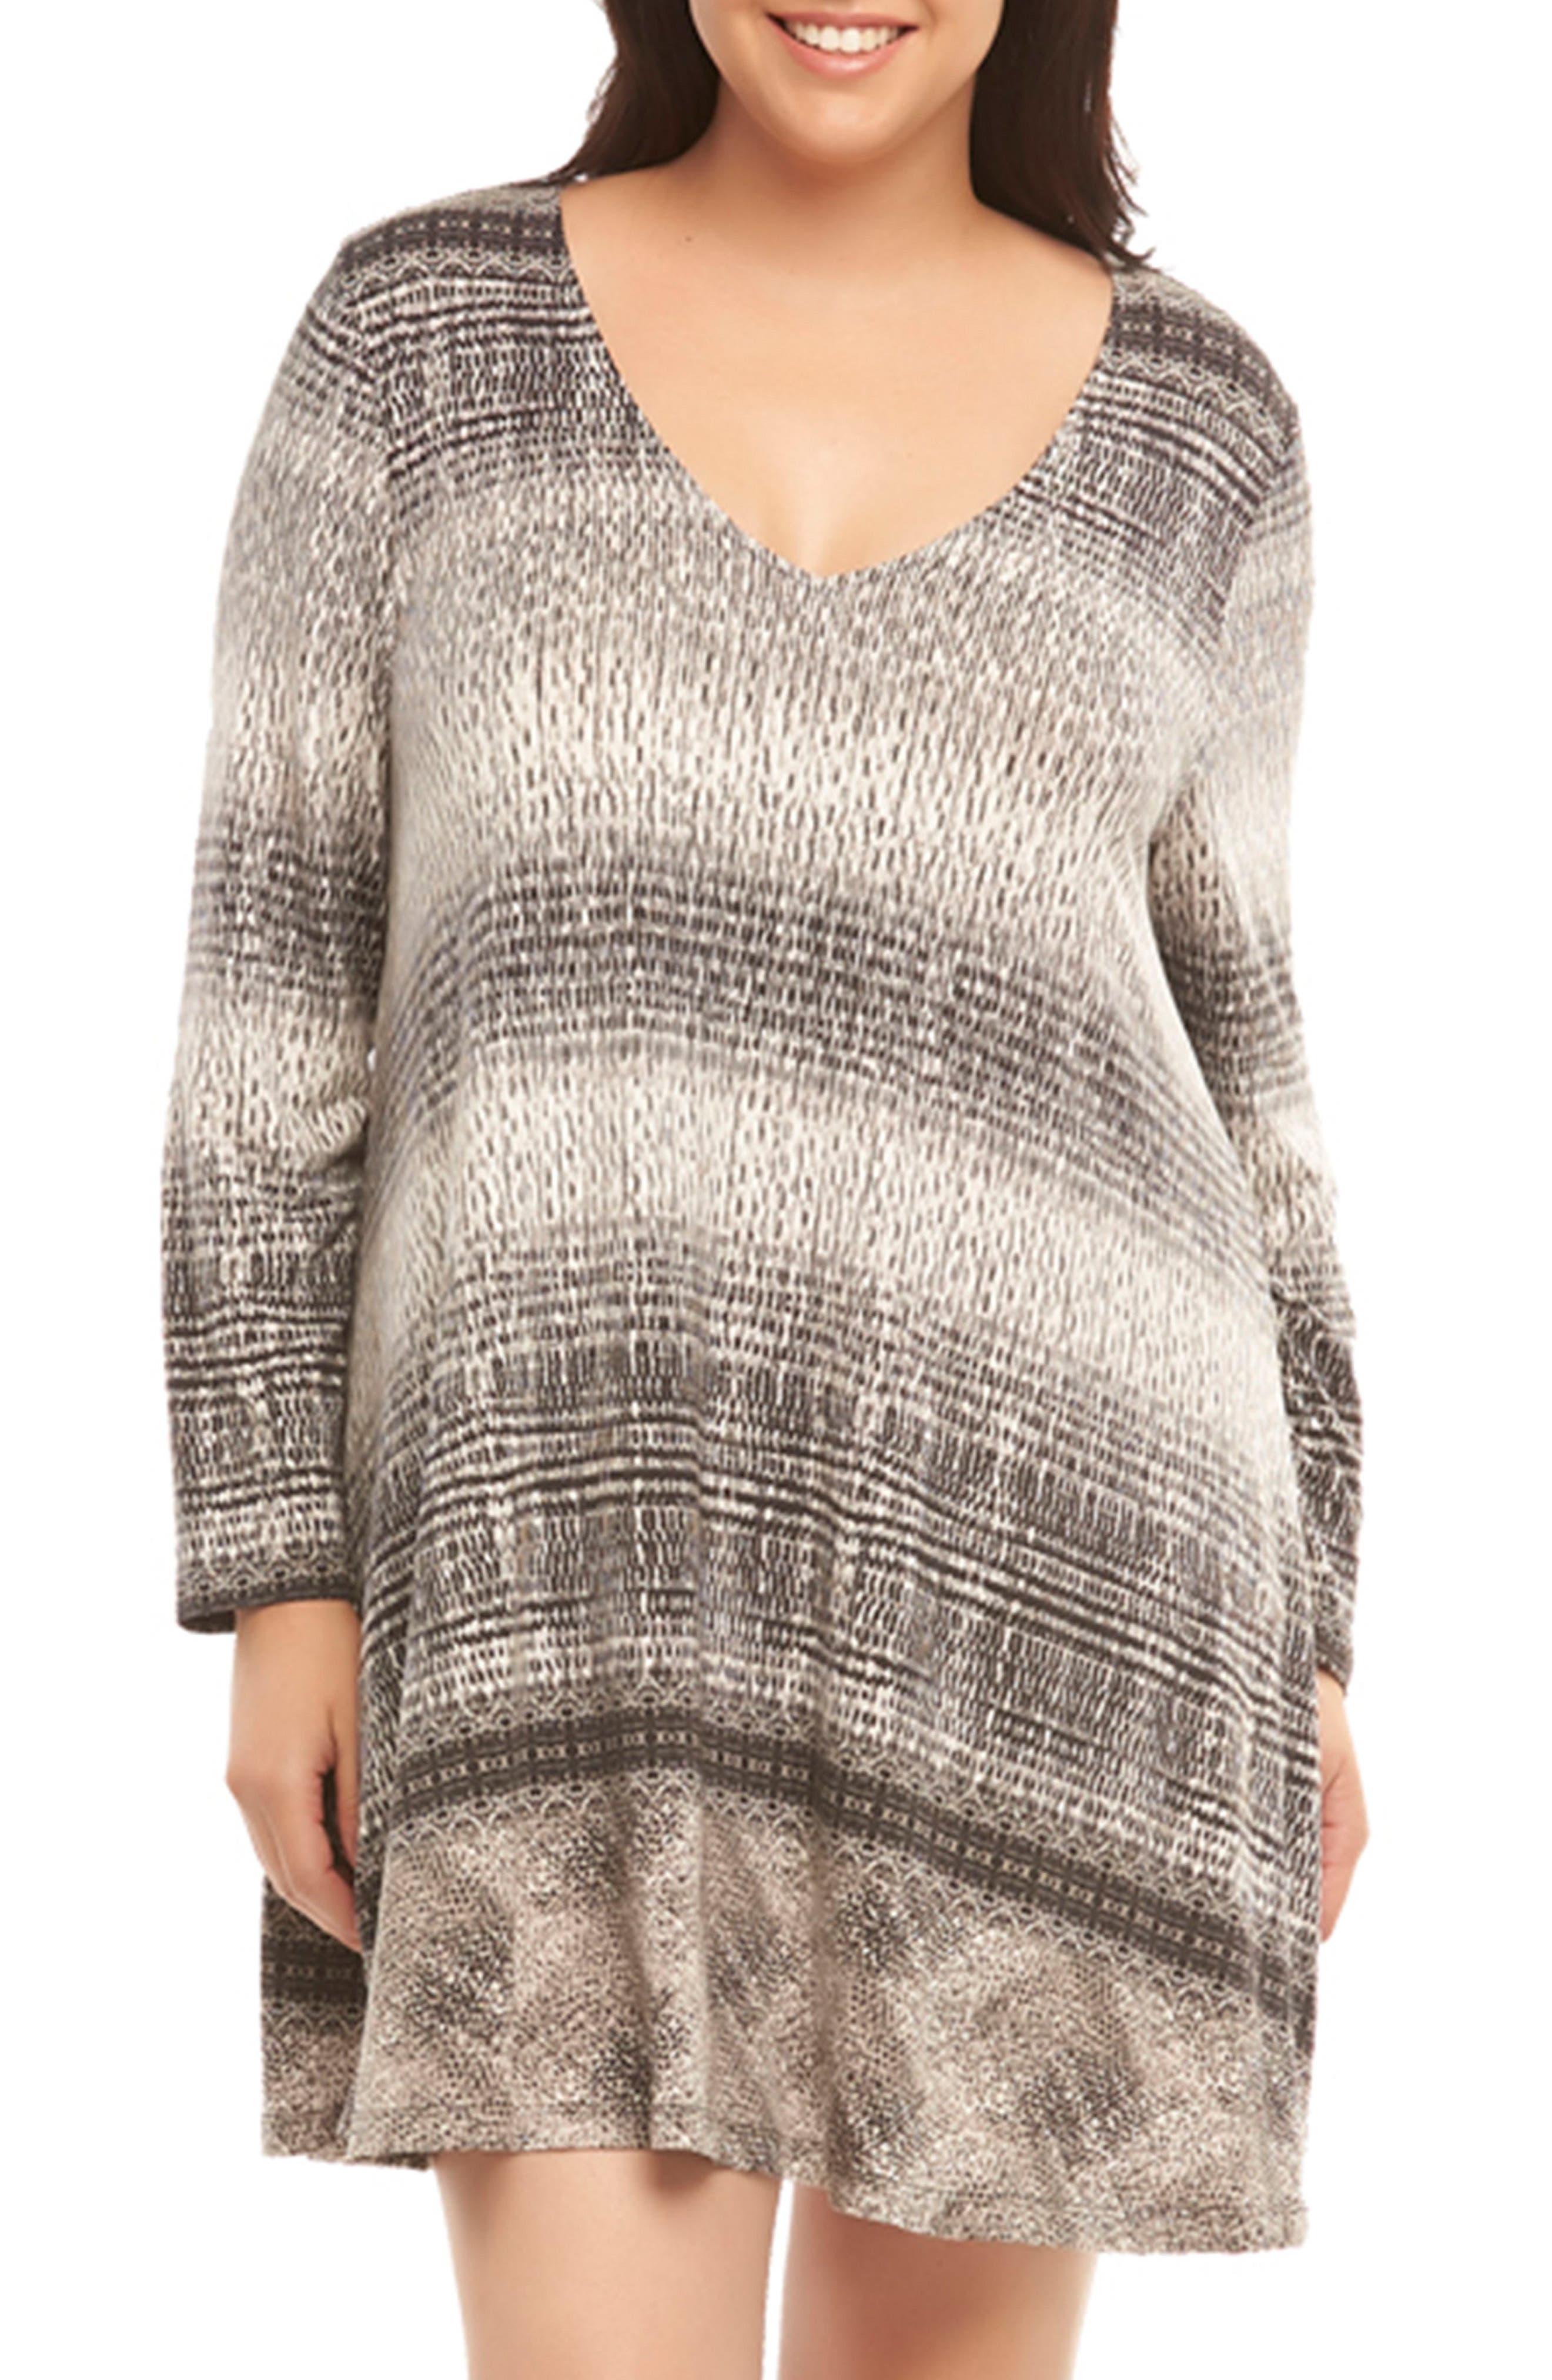 Alternate Image 1 Selected - Tart Suzi Knit A-Line Dress